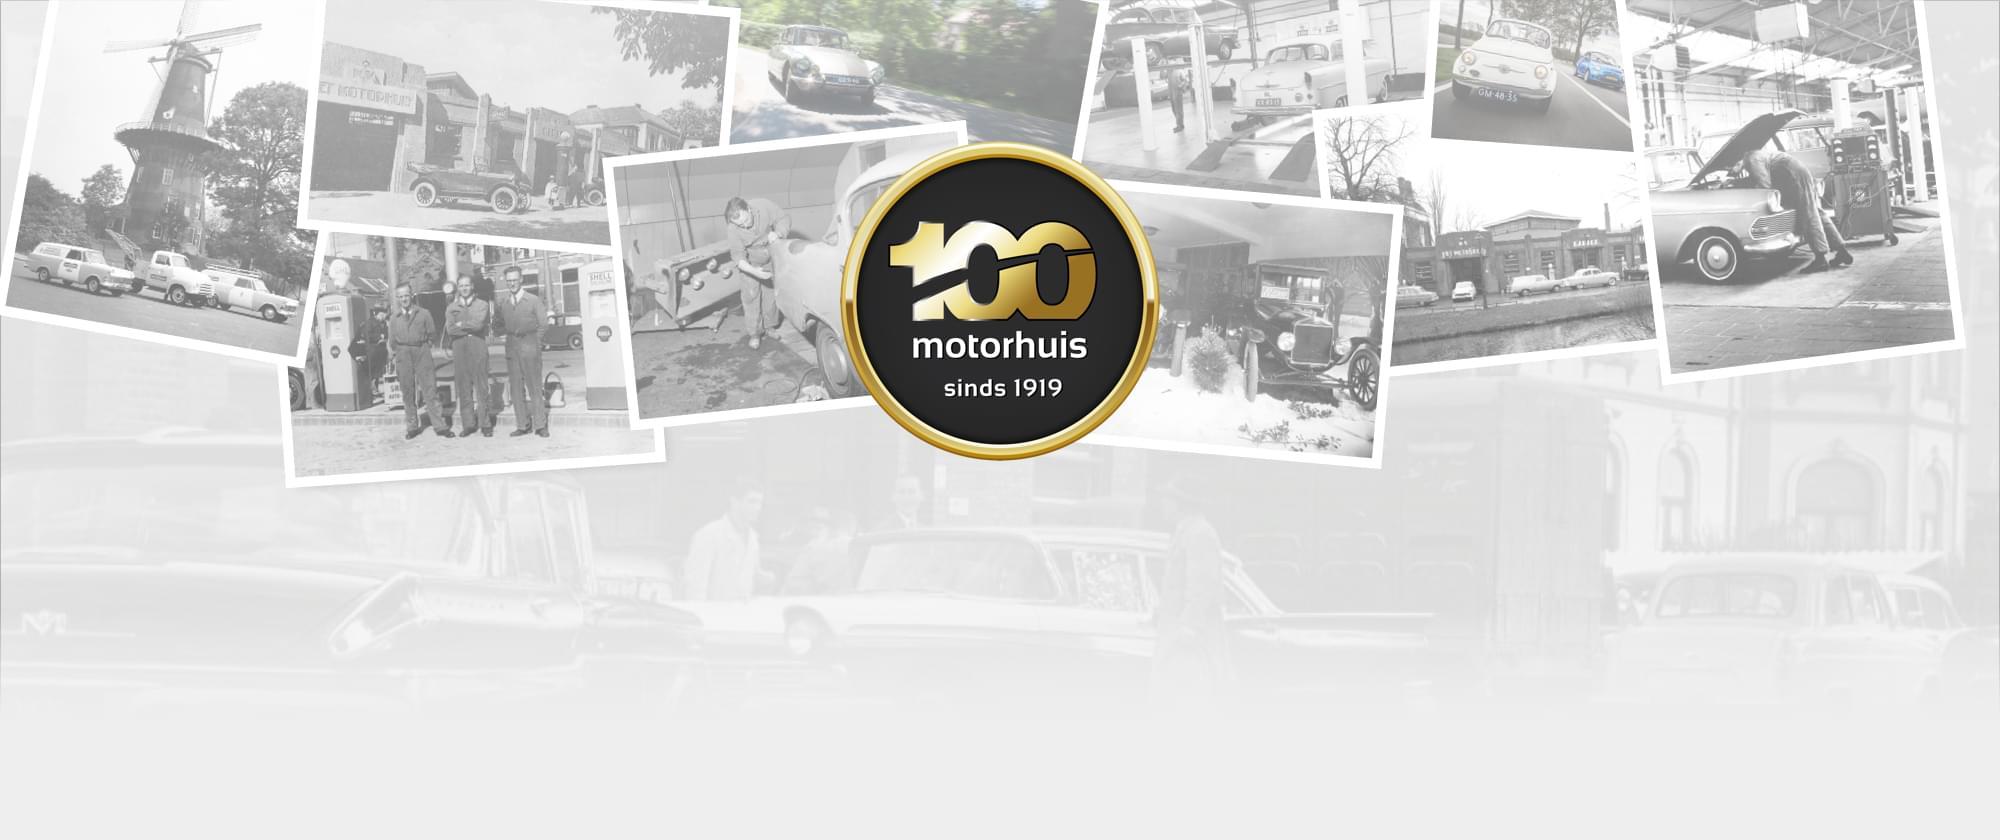 Motorhuis 100 jaar